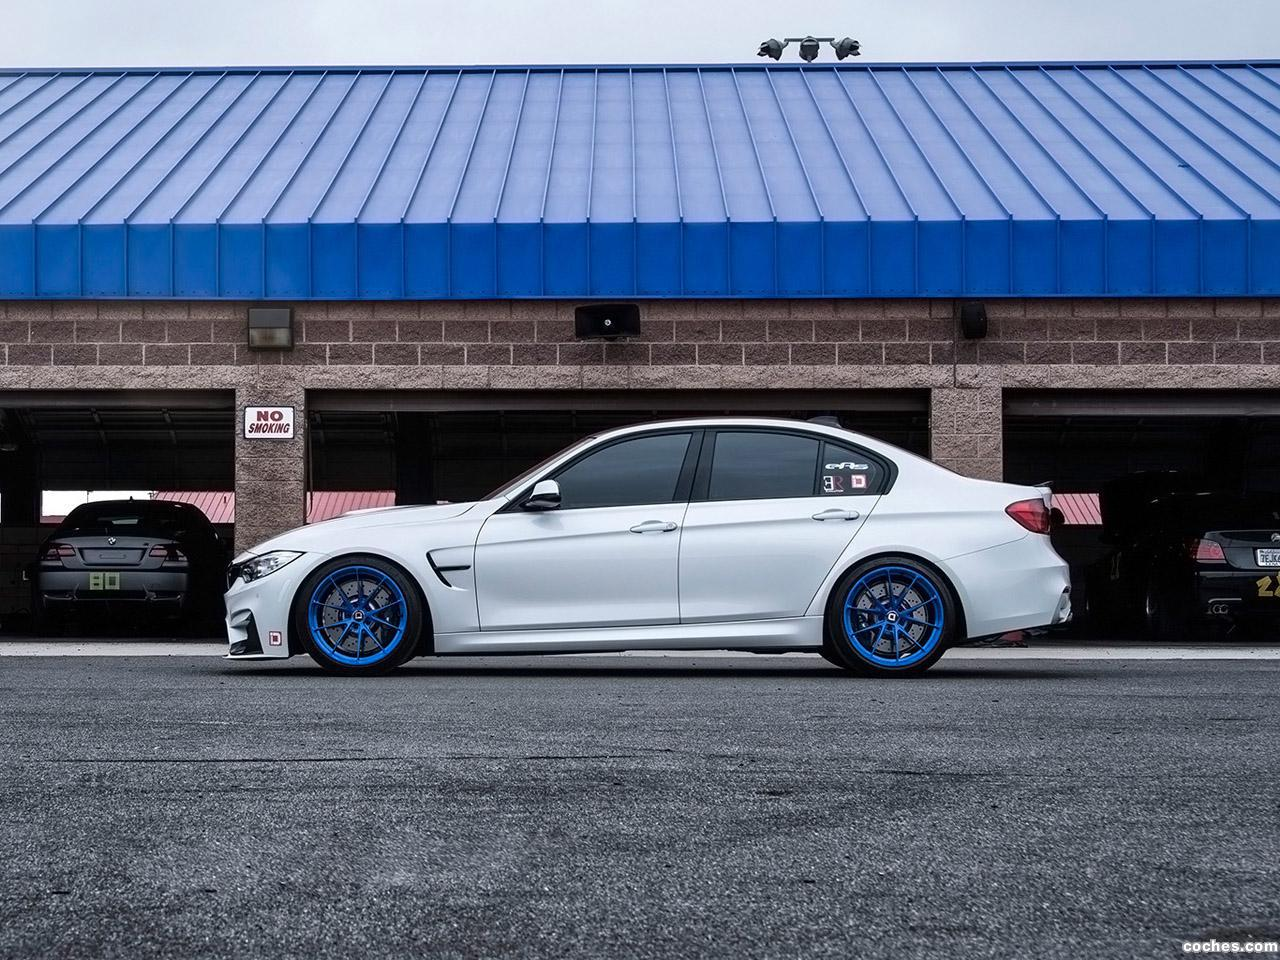 Foto 3 de Klassen iD BMW M3 2015